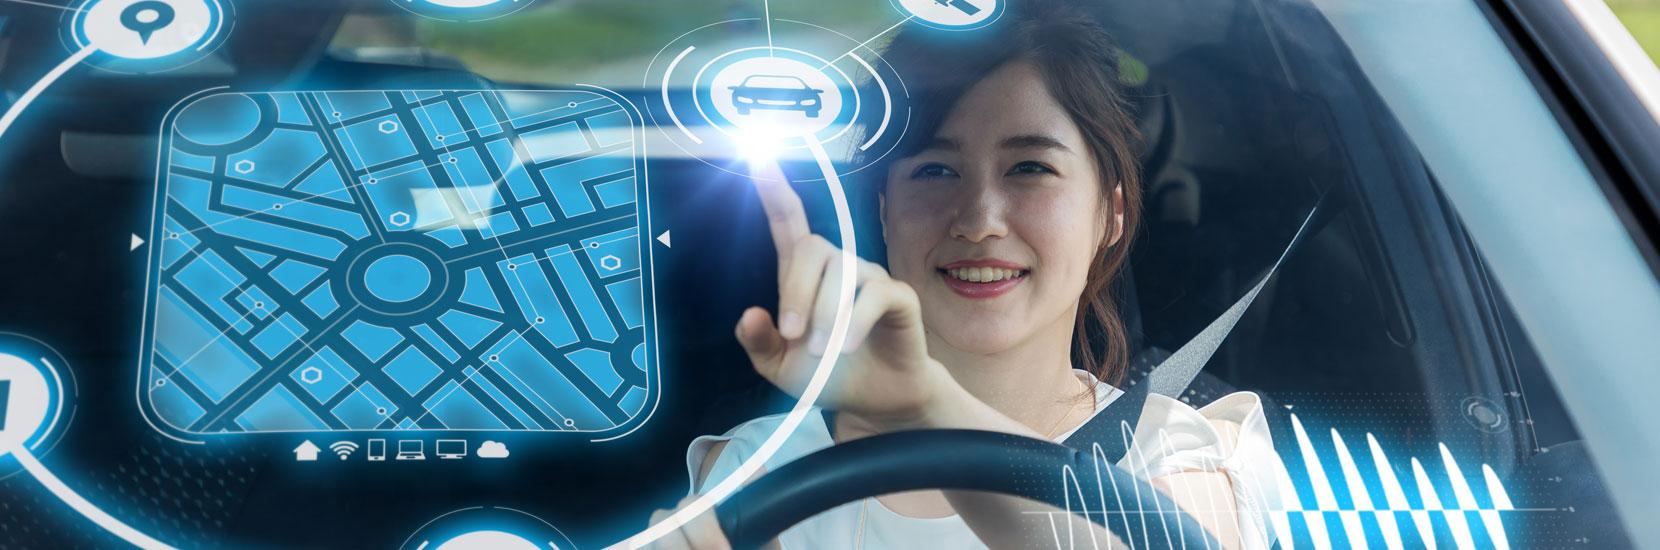 Automotive Mobility Service